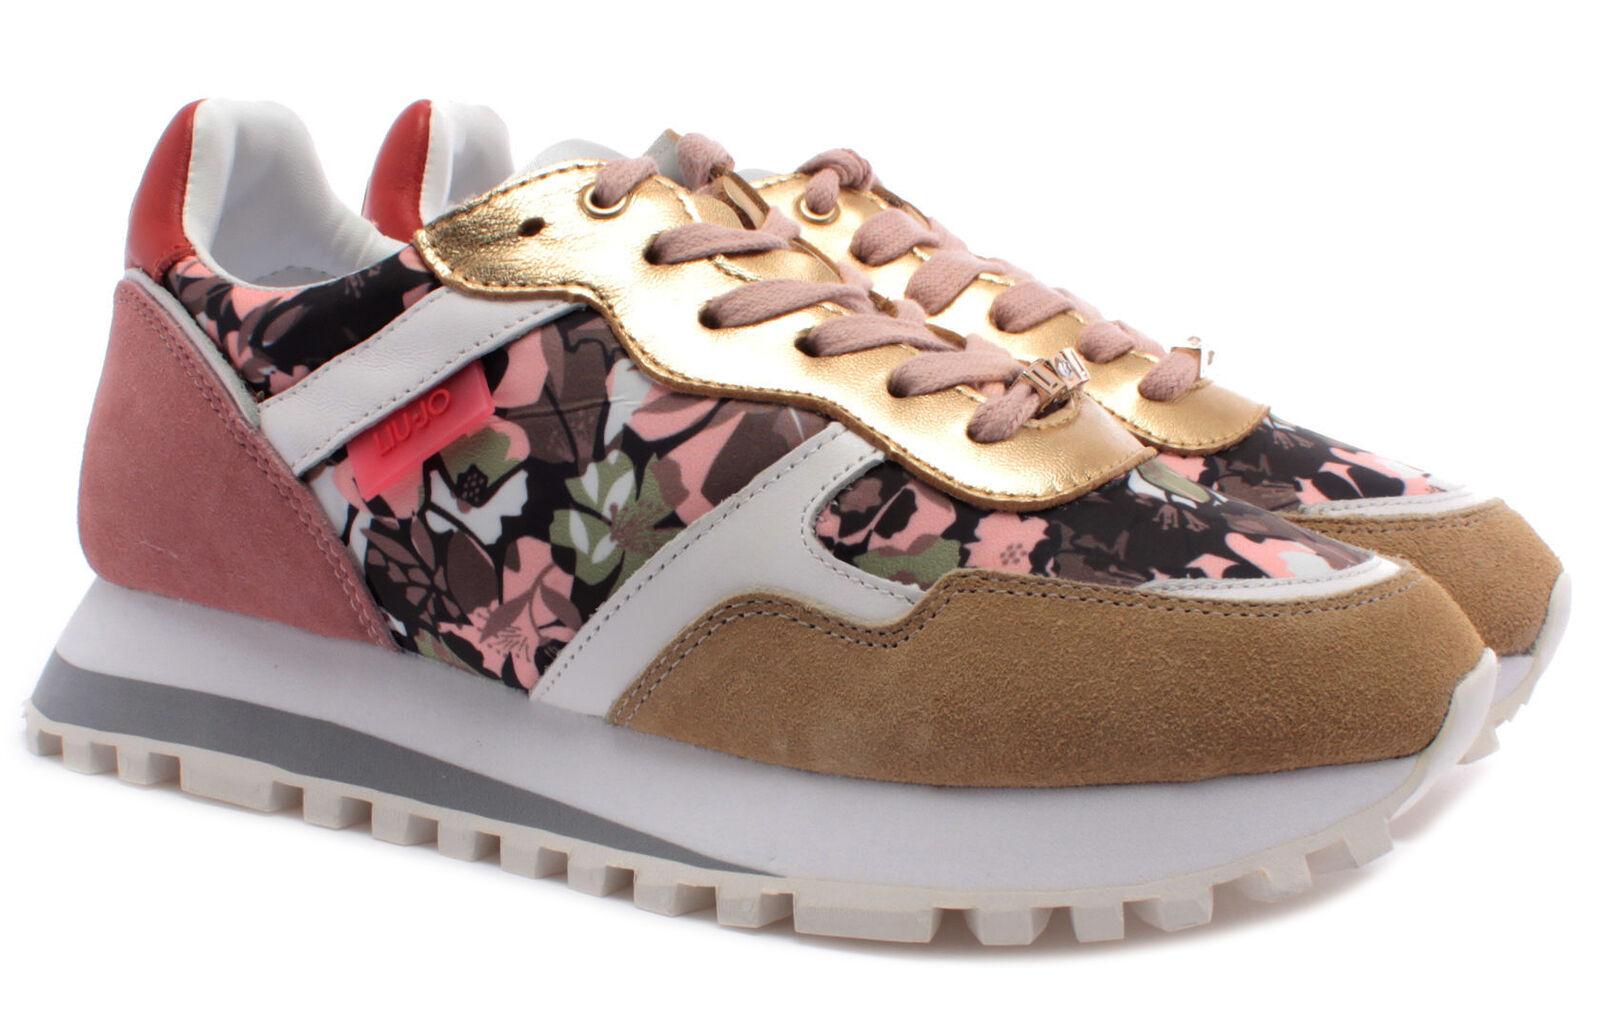 Damen Turnschuhe LIU JO Milano Wonder 20 Flower Wildleder Fabric Beige